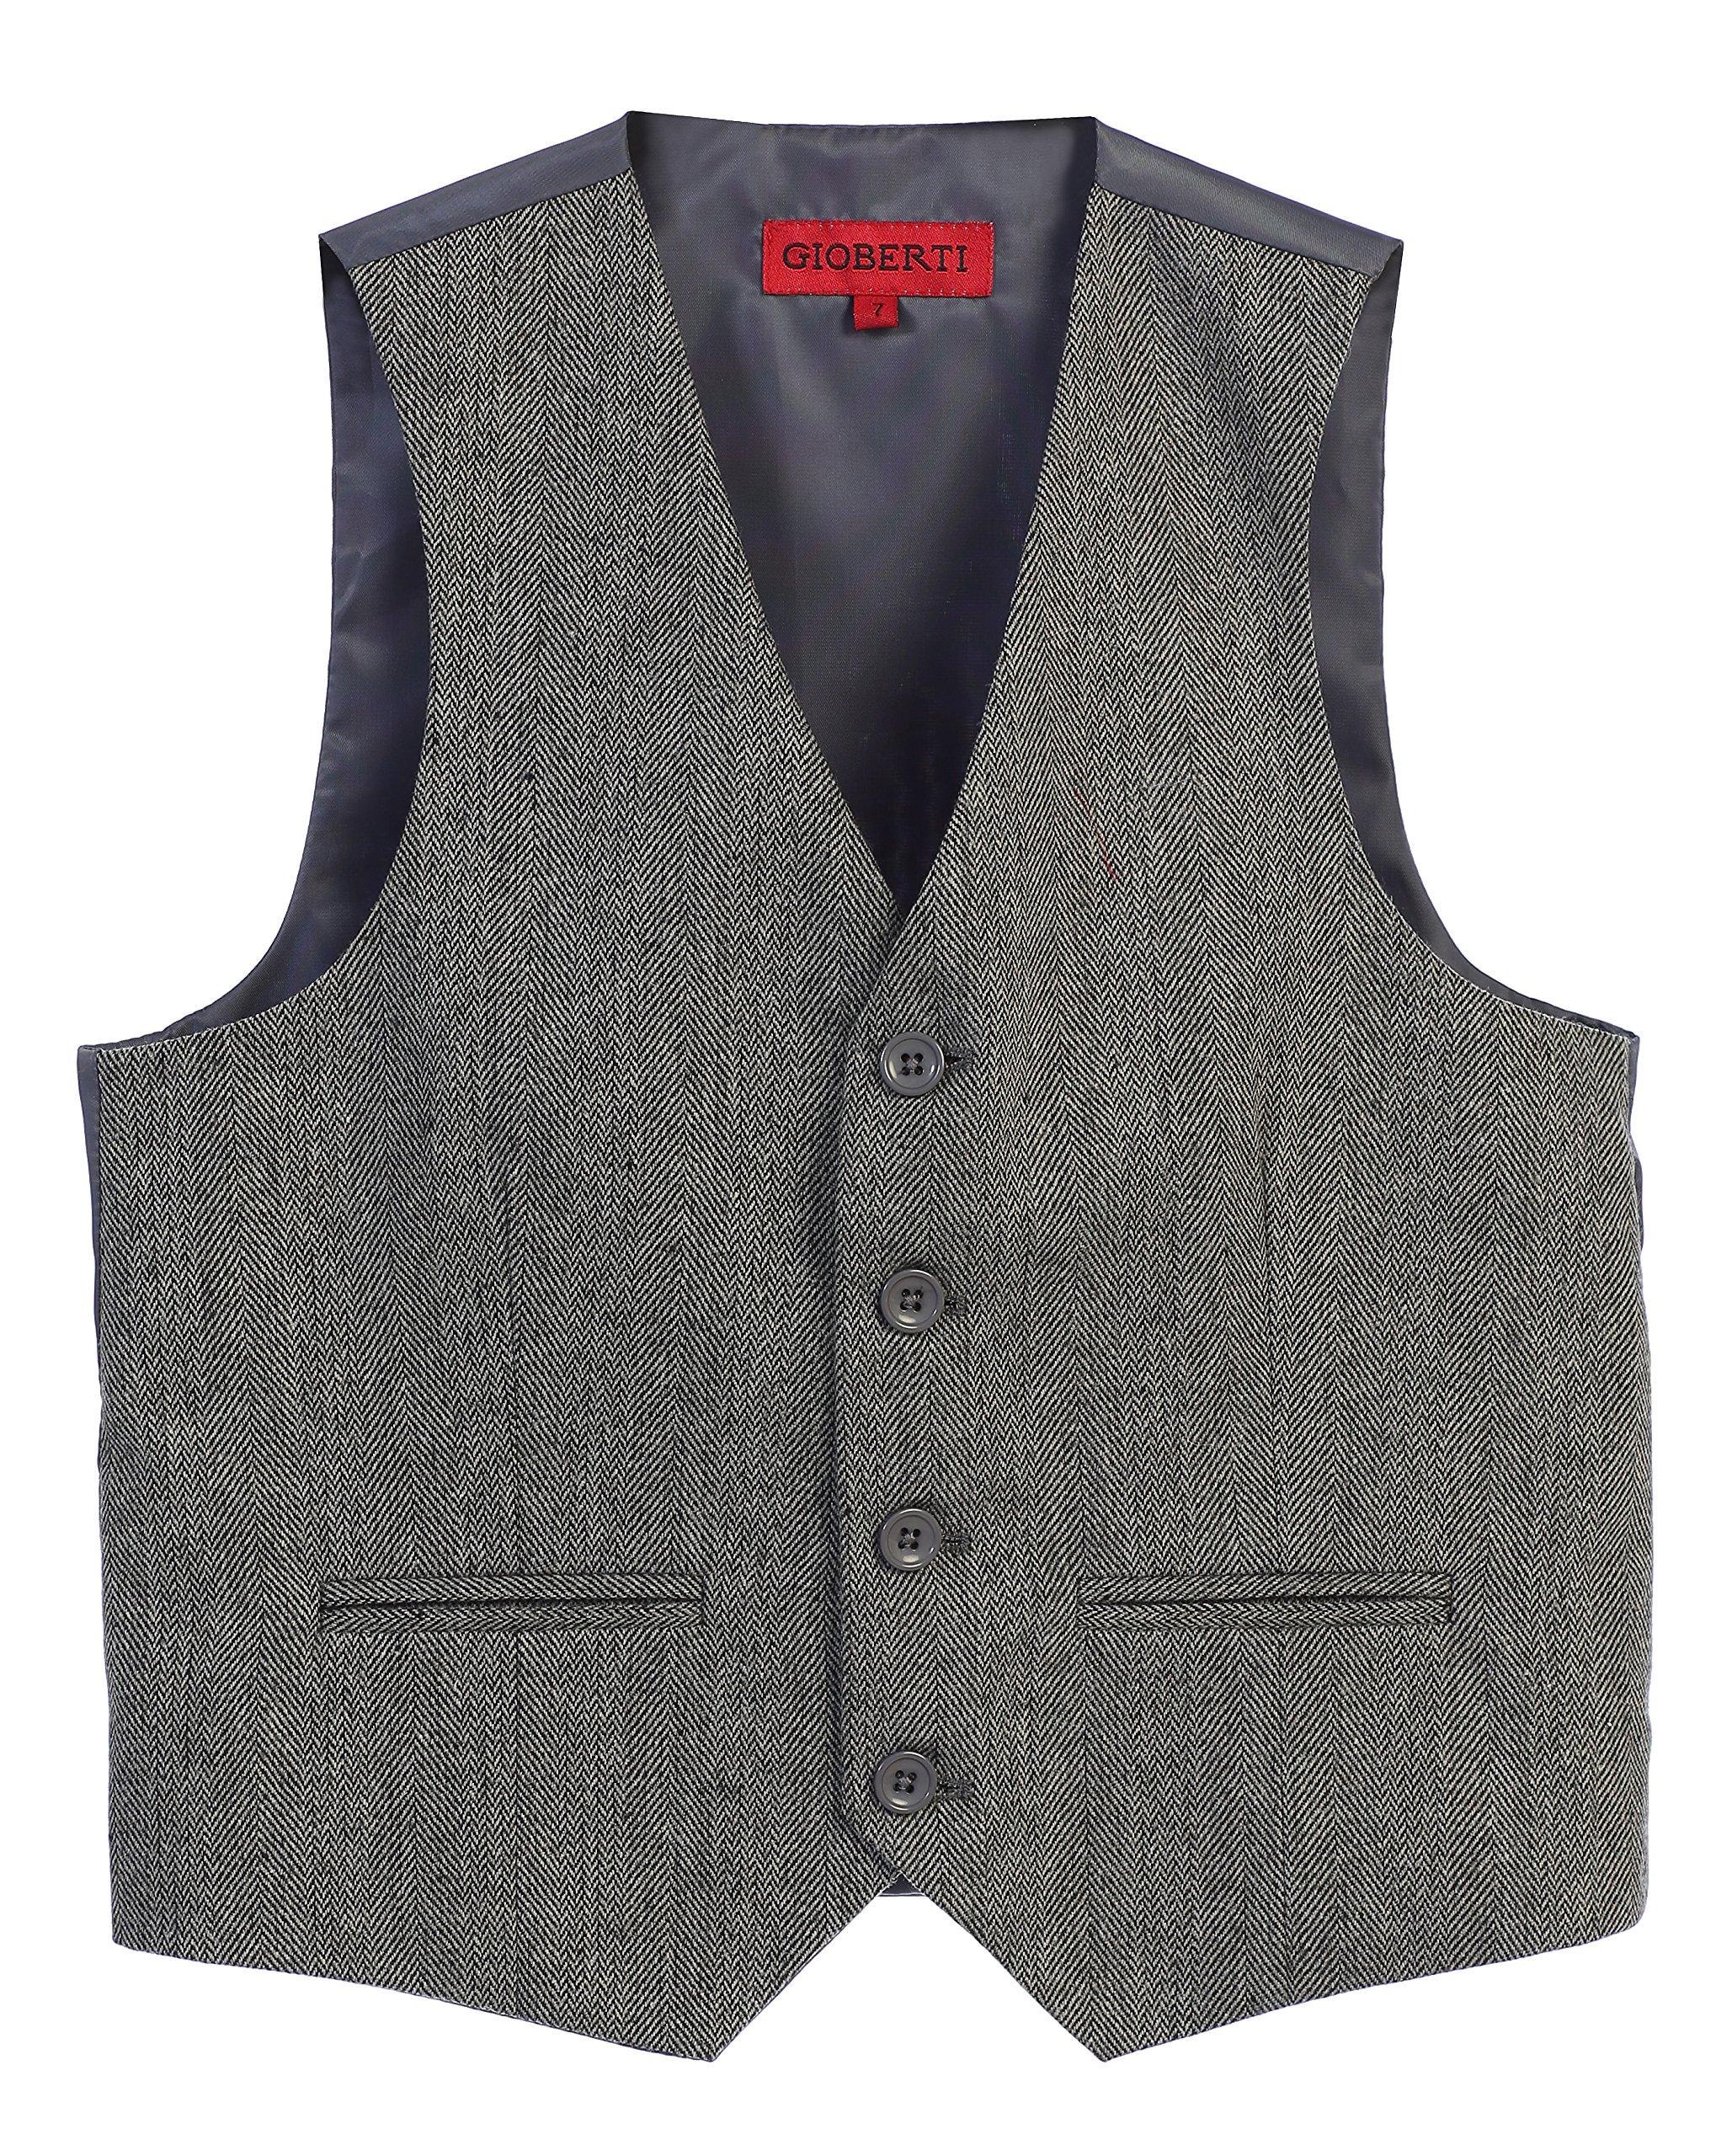 Gioberti Boy's Tweed Plaid Formal Suit Vest, Herringbone Gray, Size 8